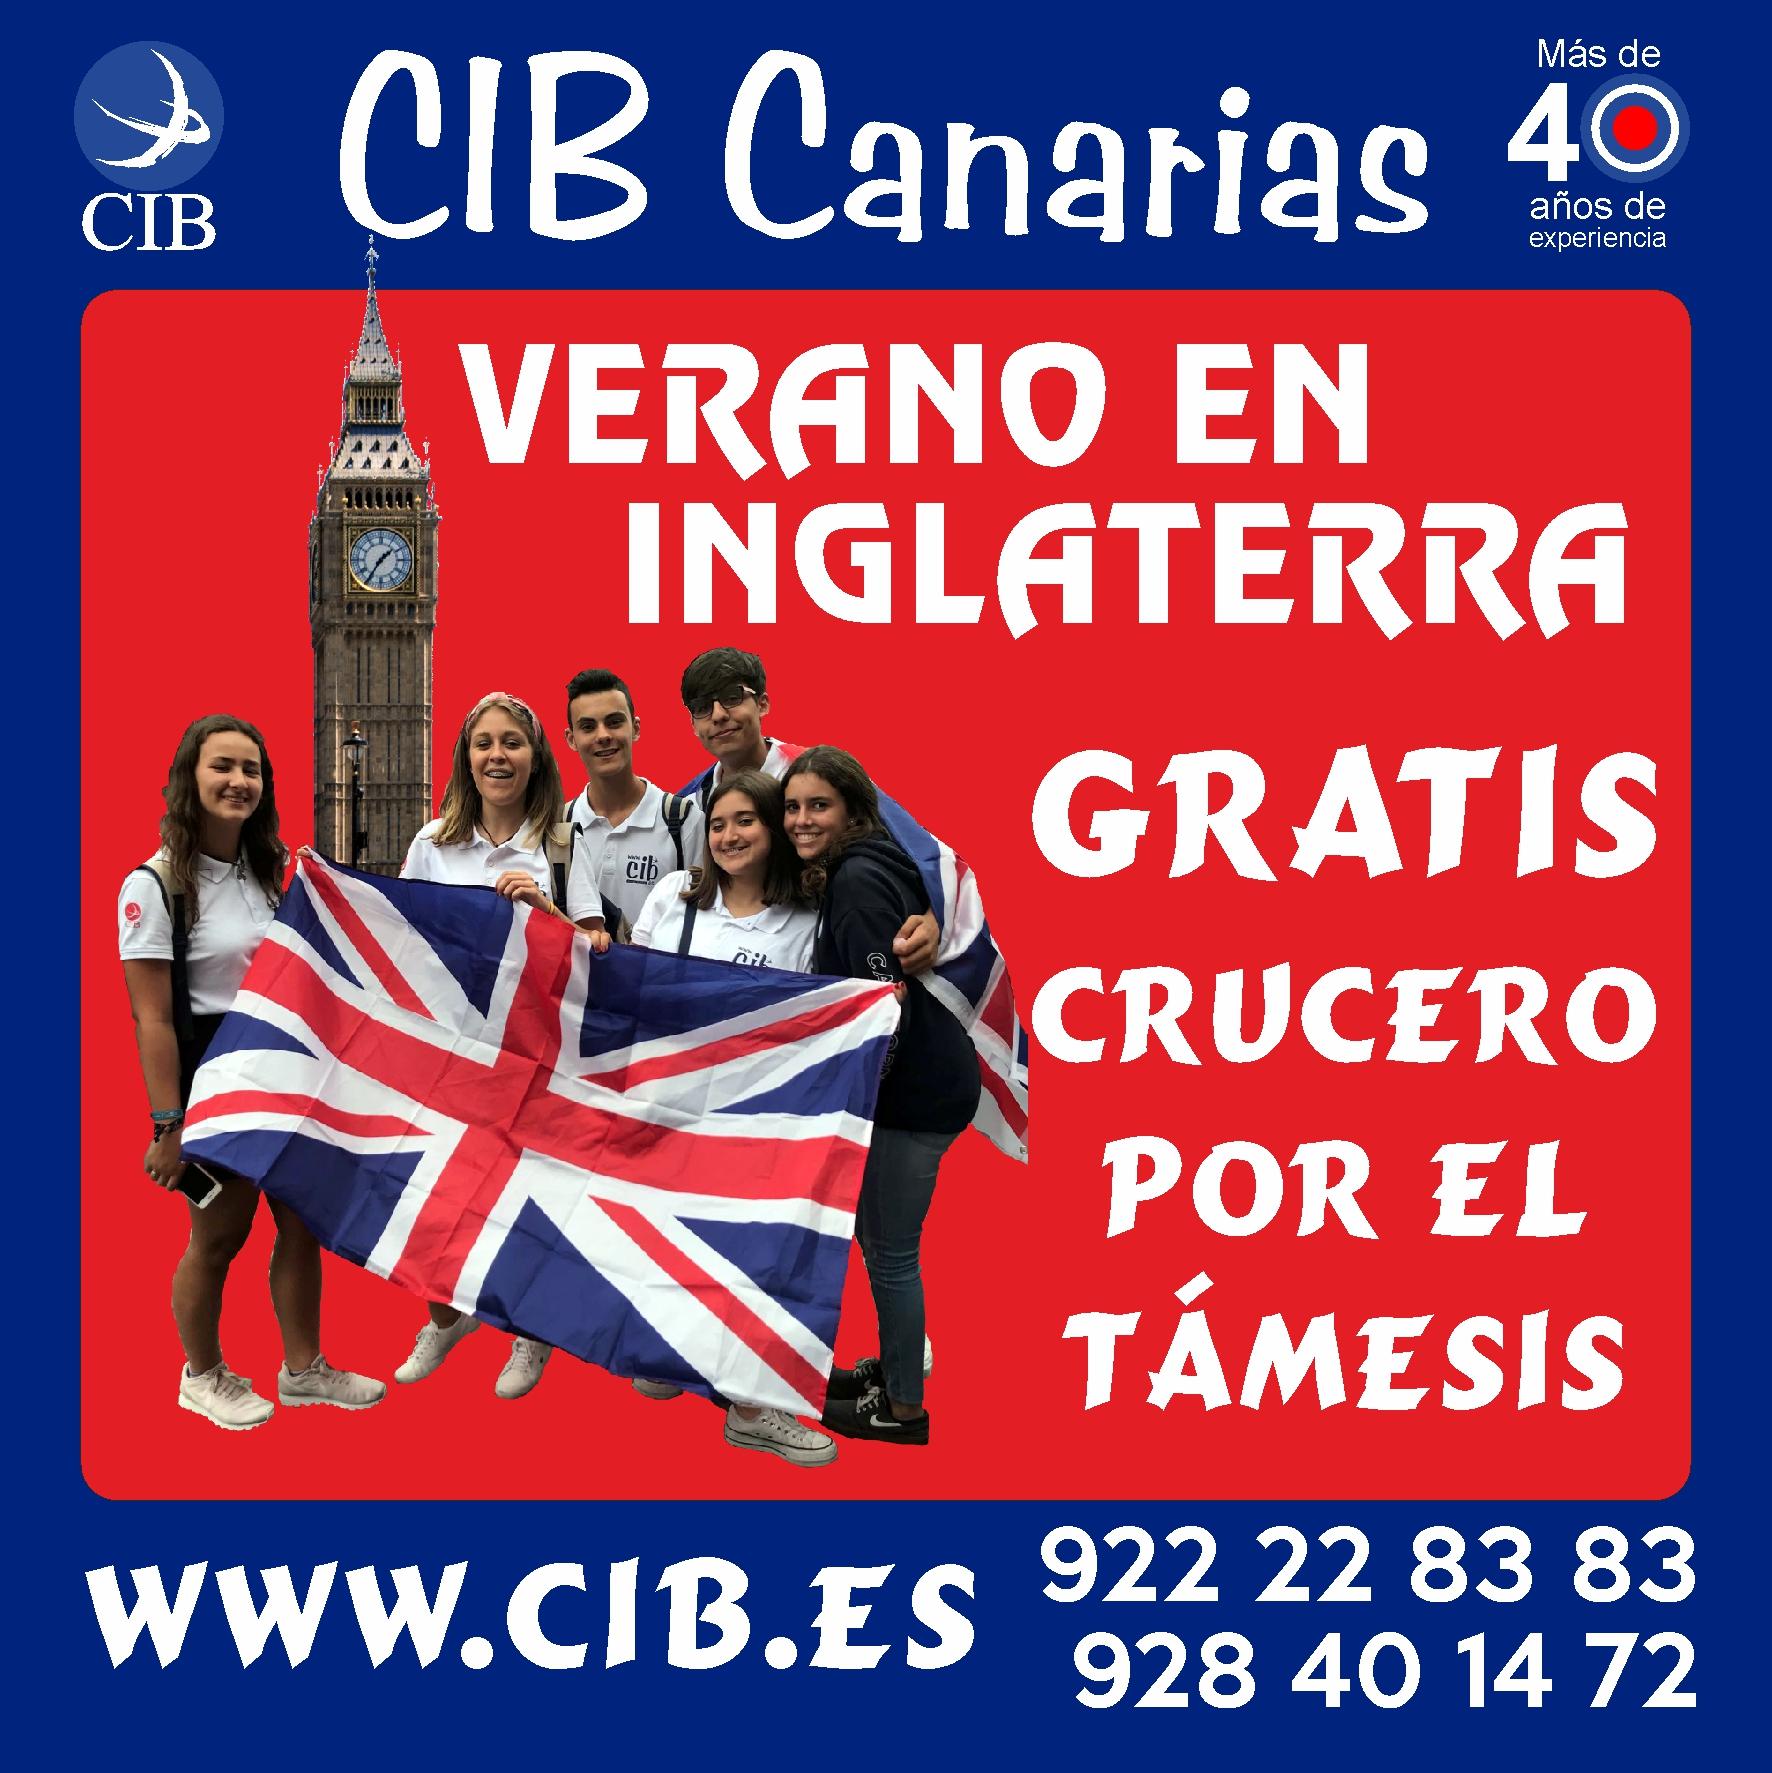 Academia CIB Canarias – desde 1976